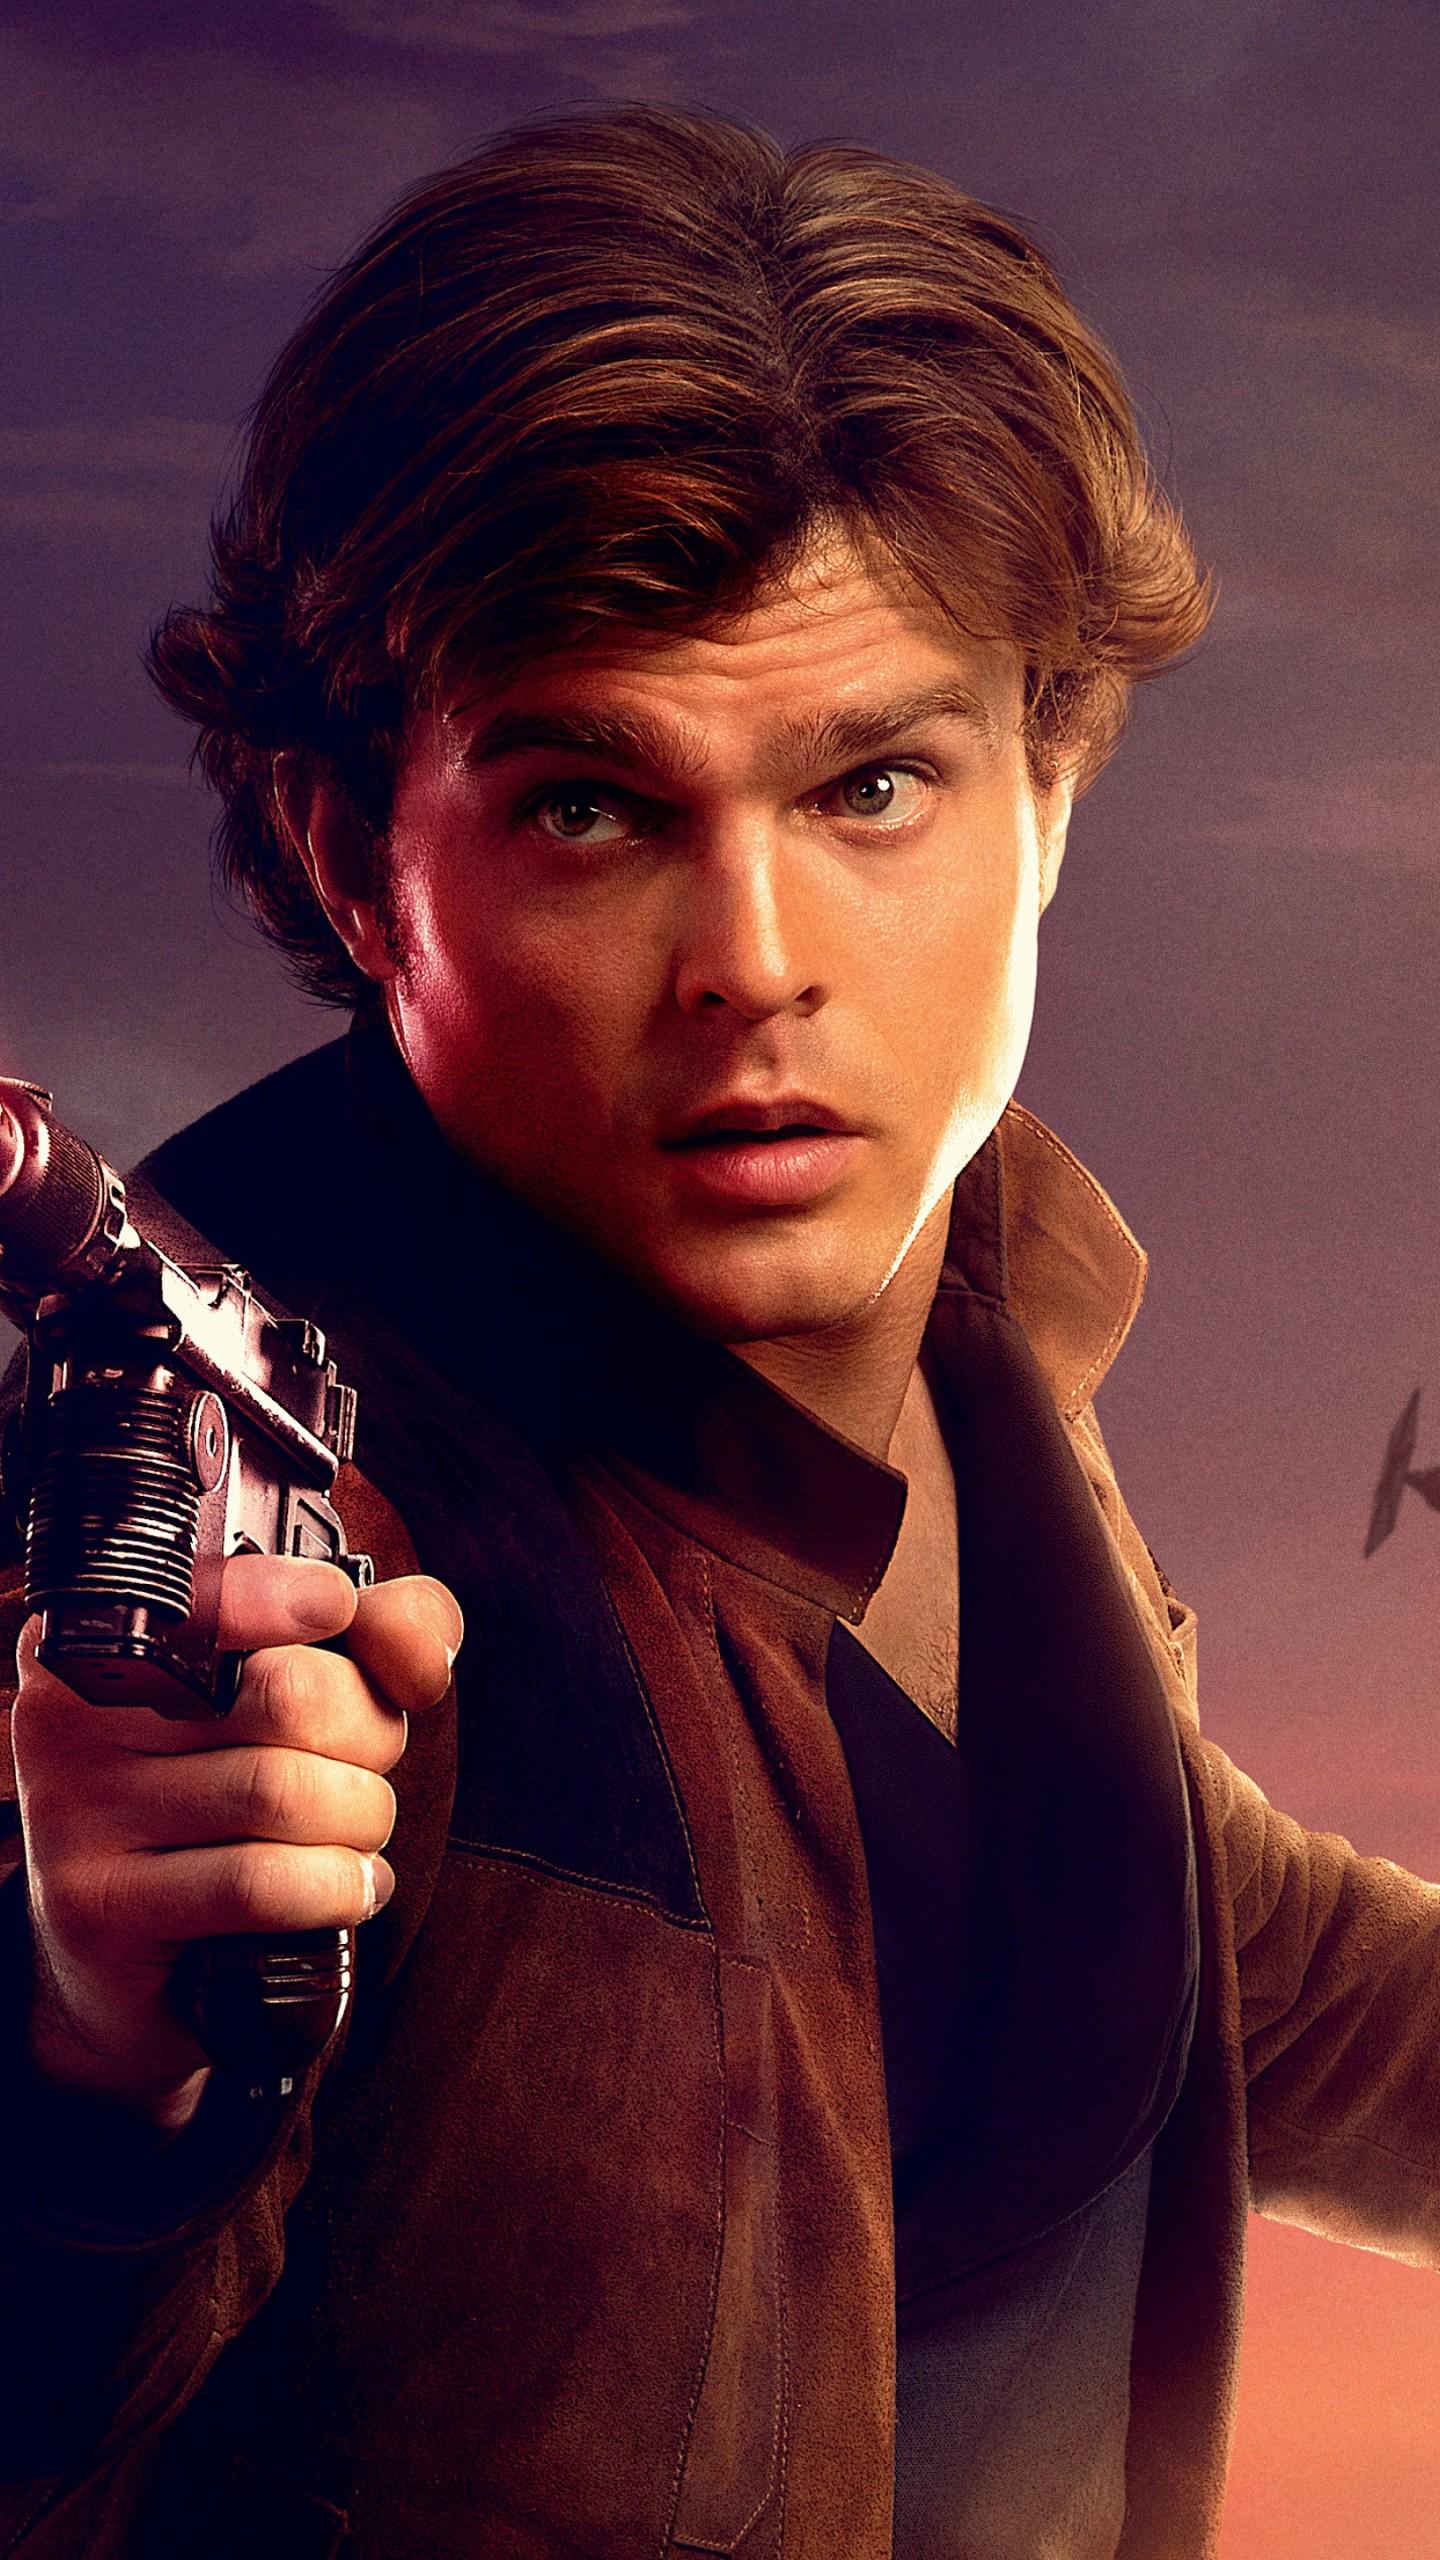 Wallpaper Solo A Star Wars Story Han Solo 4k 5k Movies 18412